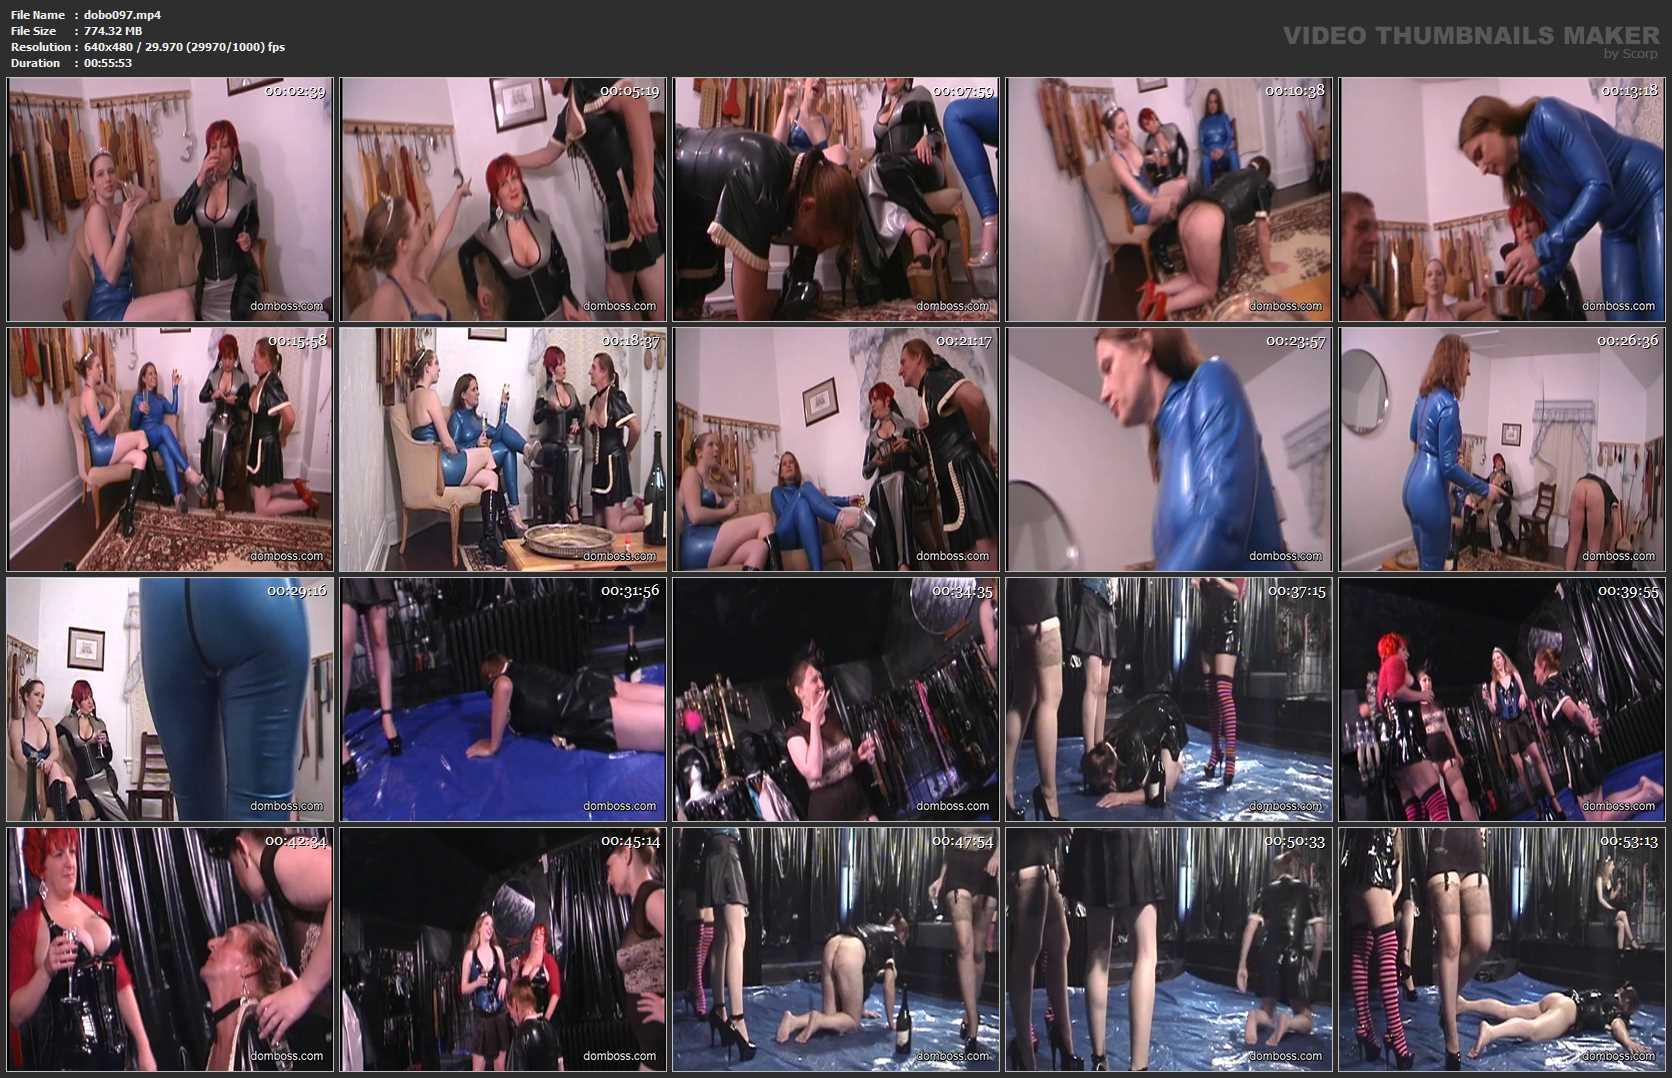 Mistress Kat, Princess Kali, Domina Irene Boss In Scene: Let it Rain - DOMBOSS / MIB PRODUCTIONS - SD/480p/MP4